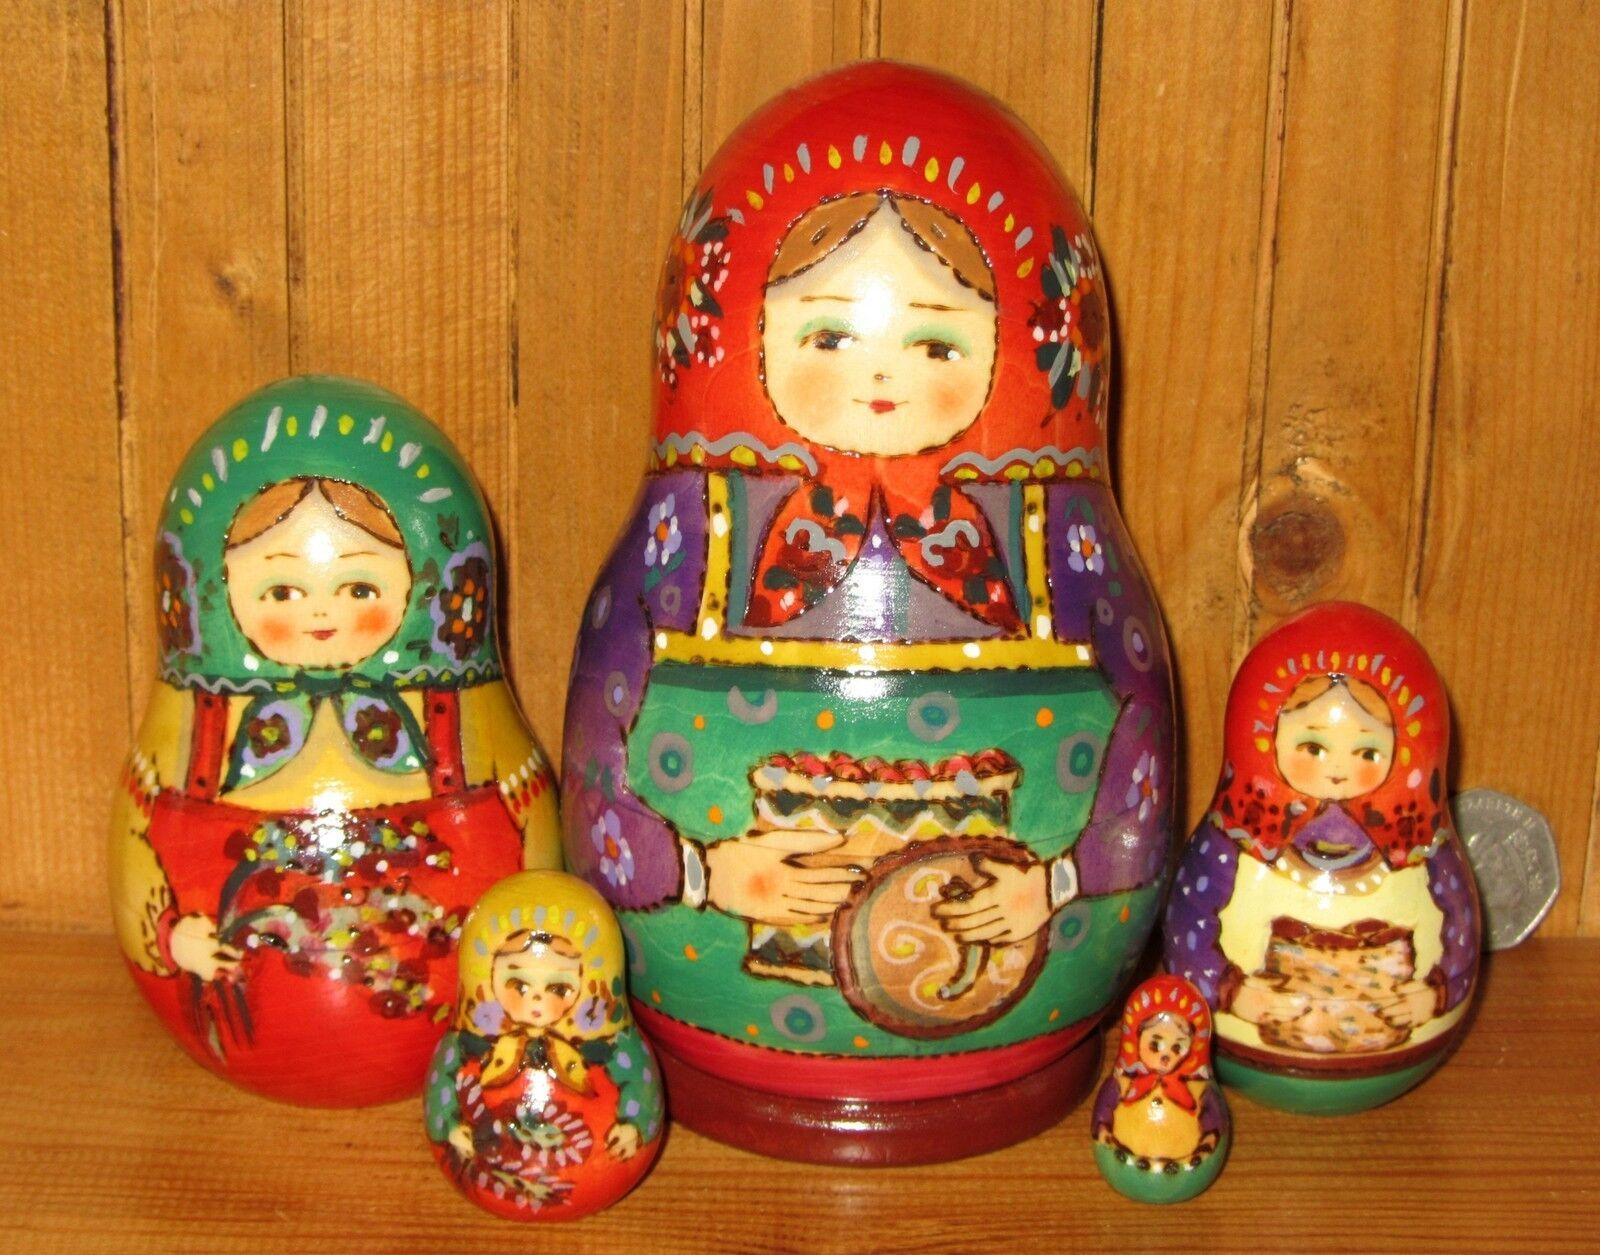 Russian nesting doll 5 HAND PAINTED TRADITIONAL Martryoshka RYABOVA